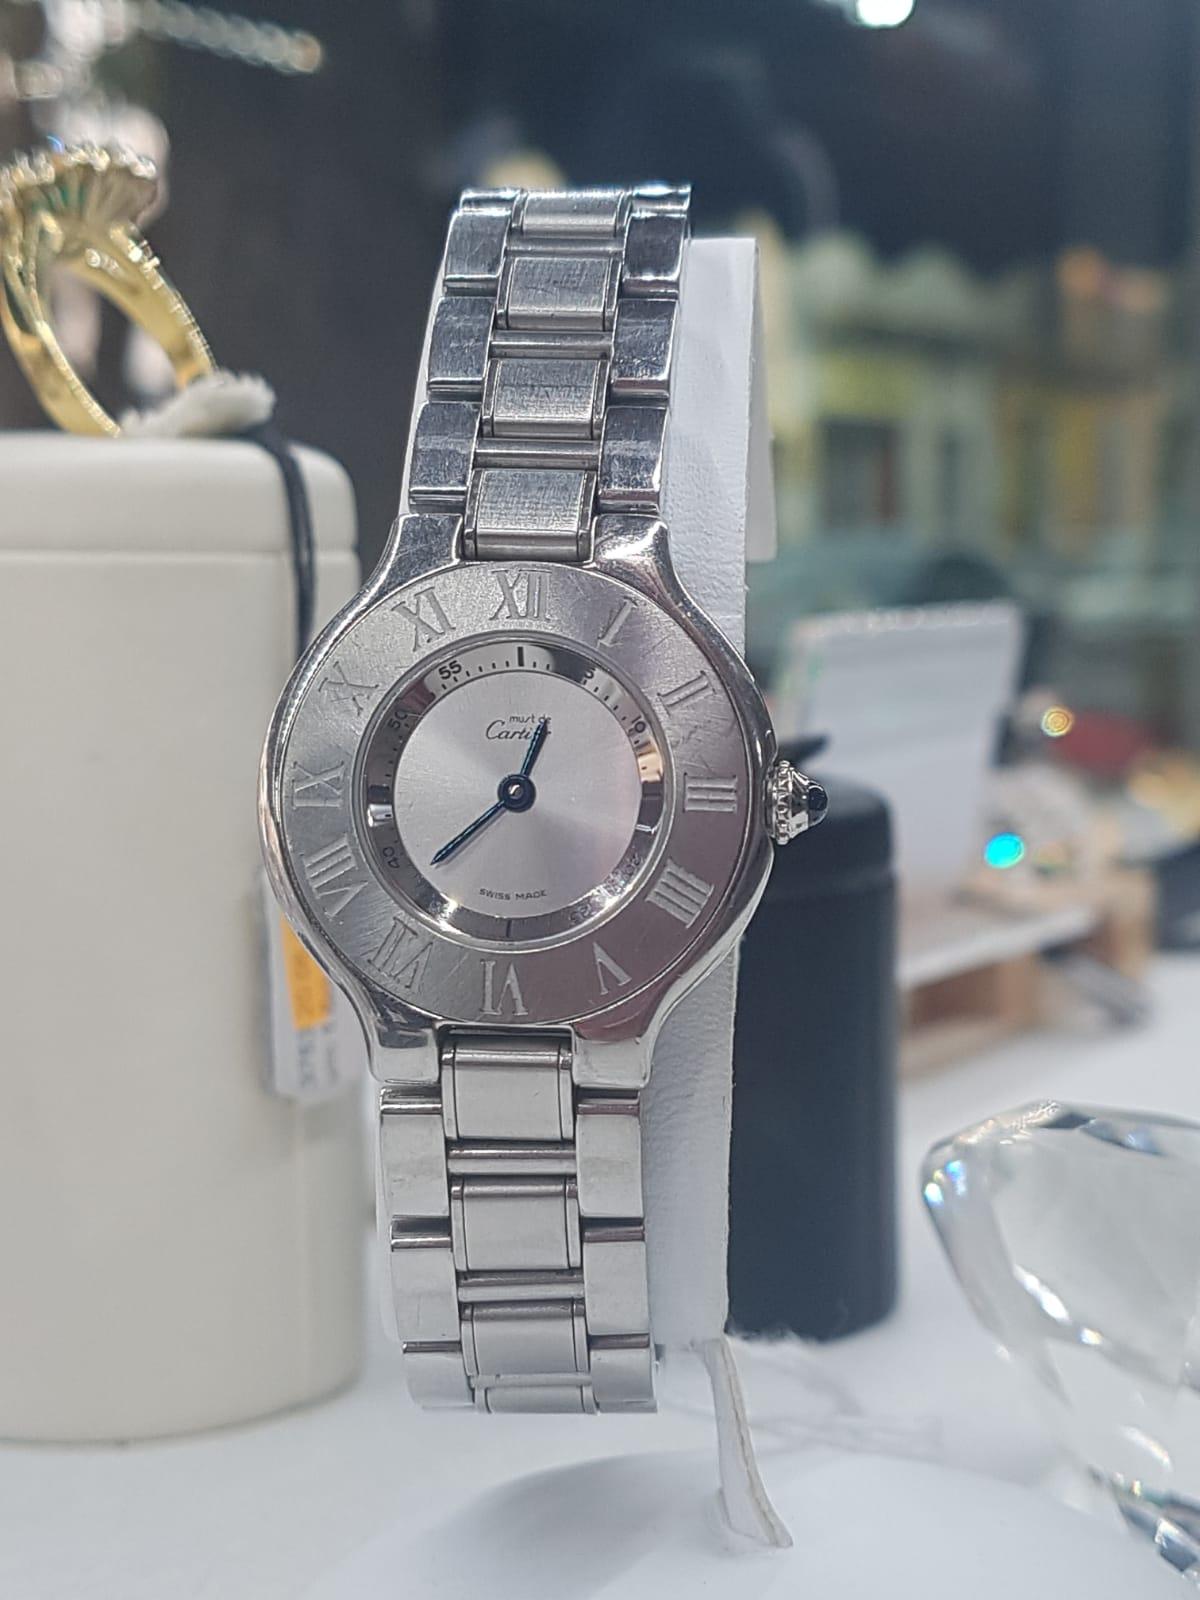 Orologio Cartier donna